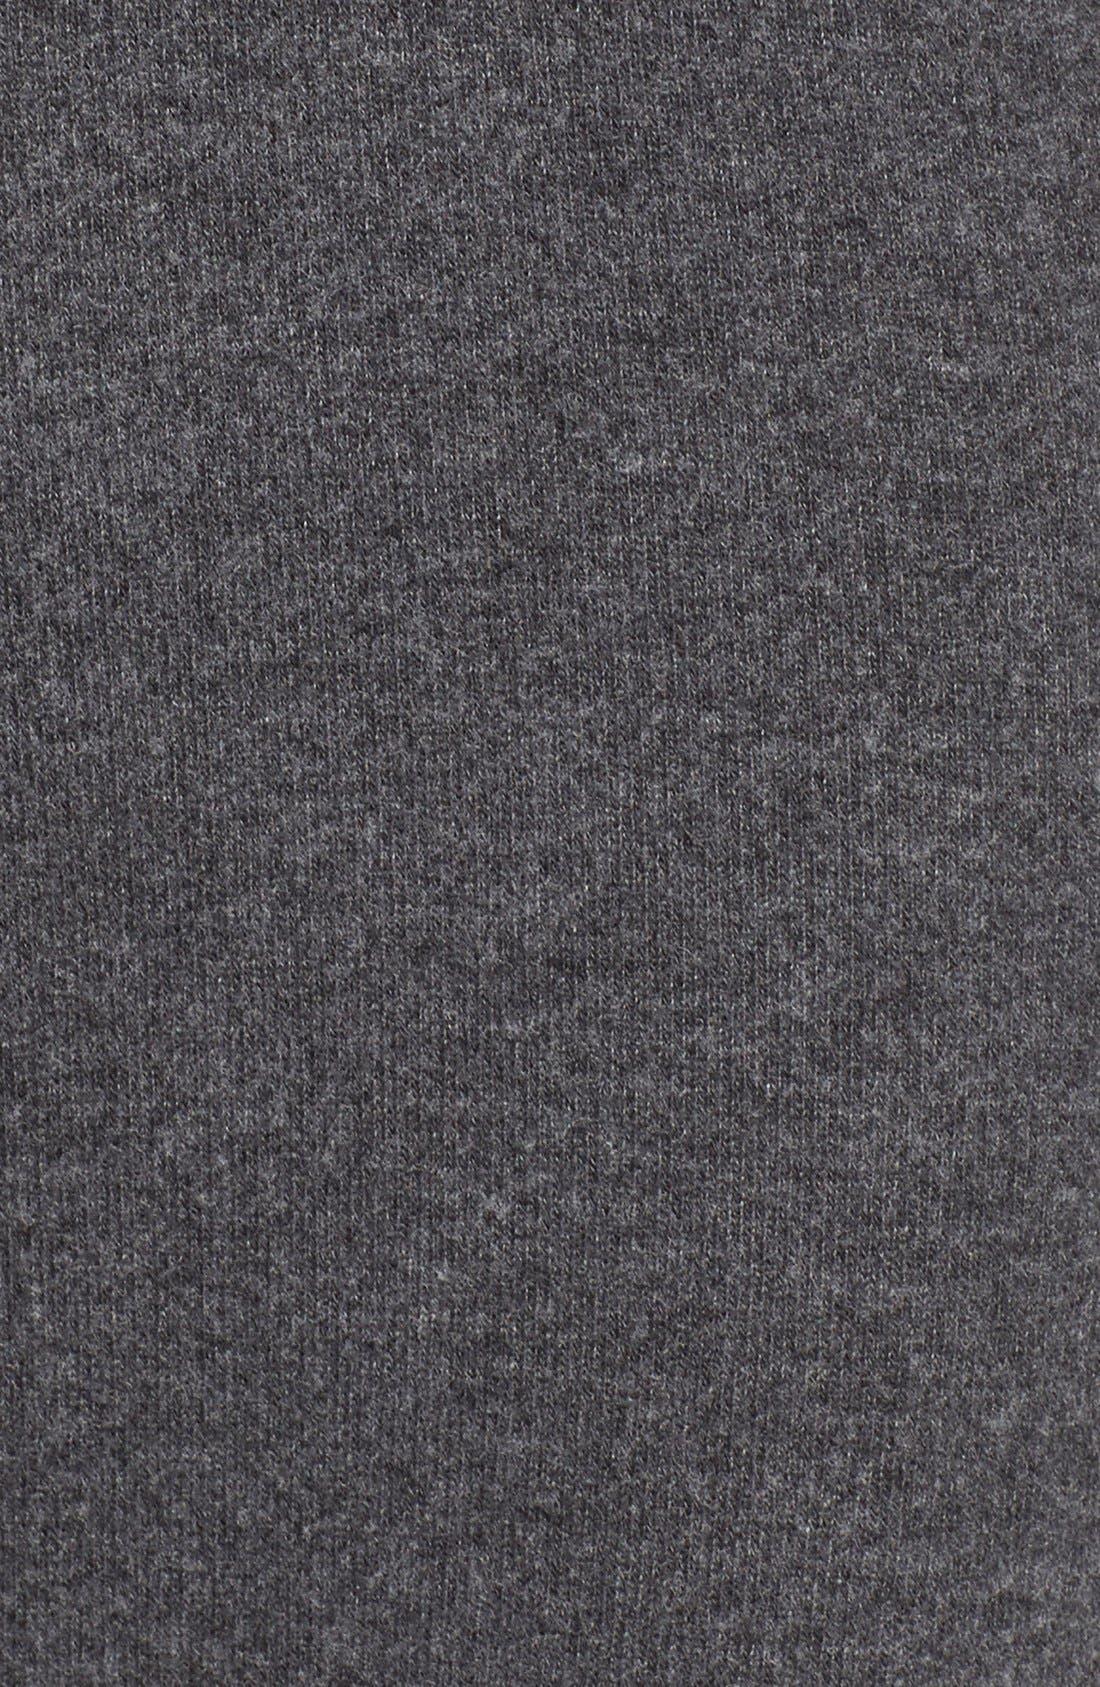 'Nate' Crop Sweatpants,                             Alternate thumbnail 4, color,                             001